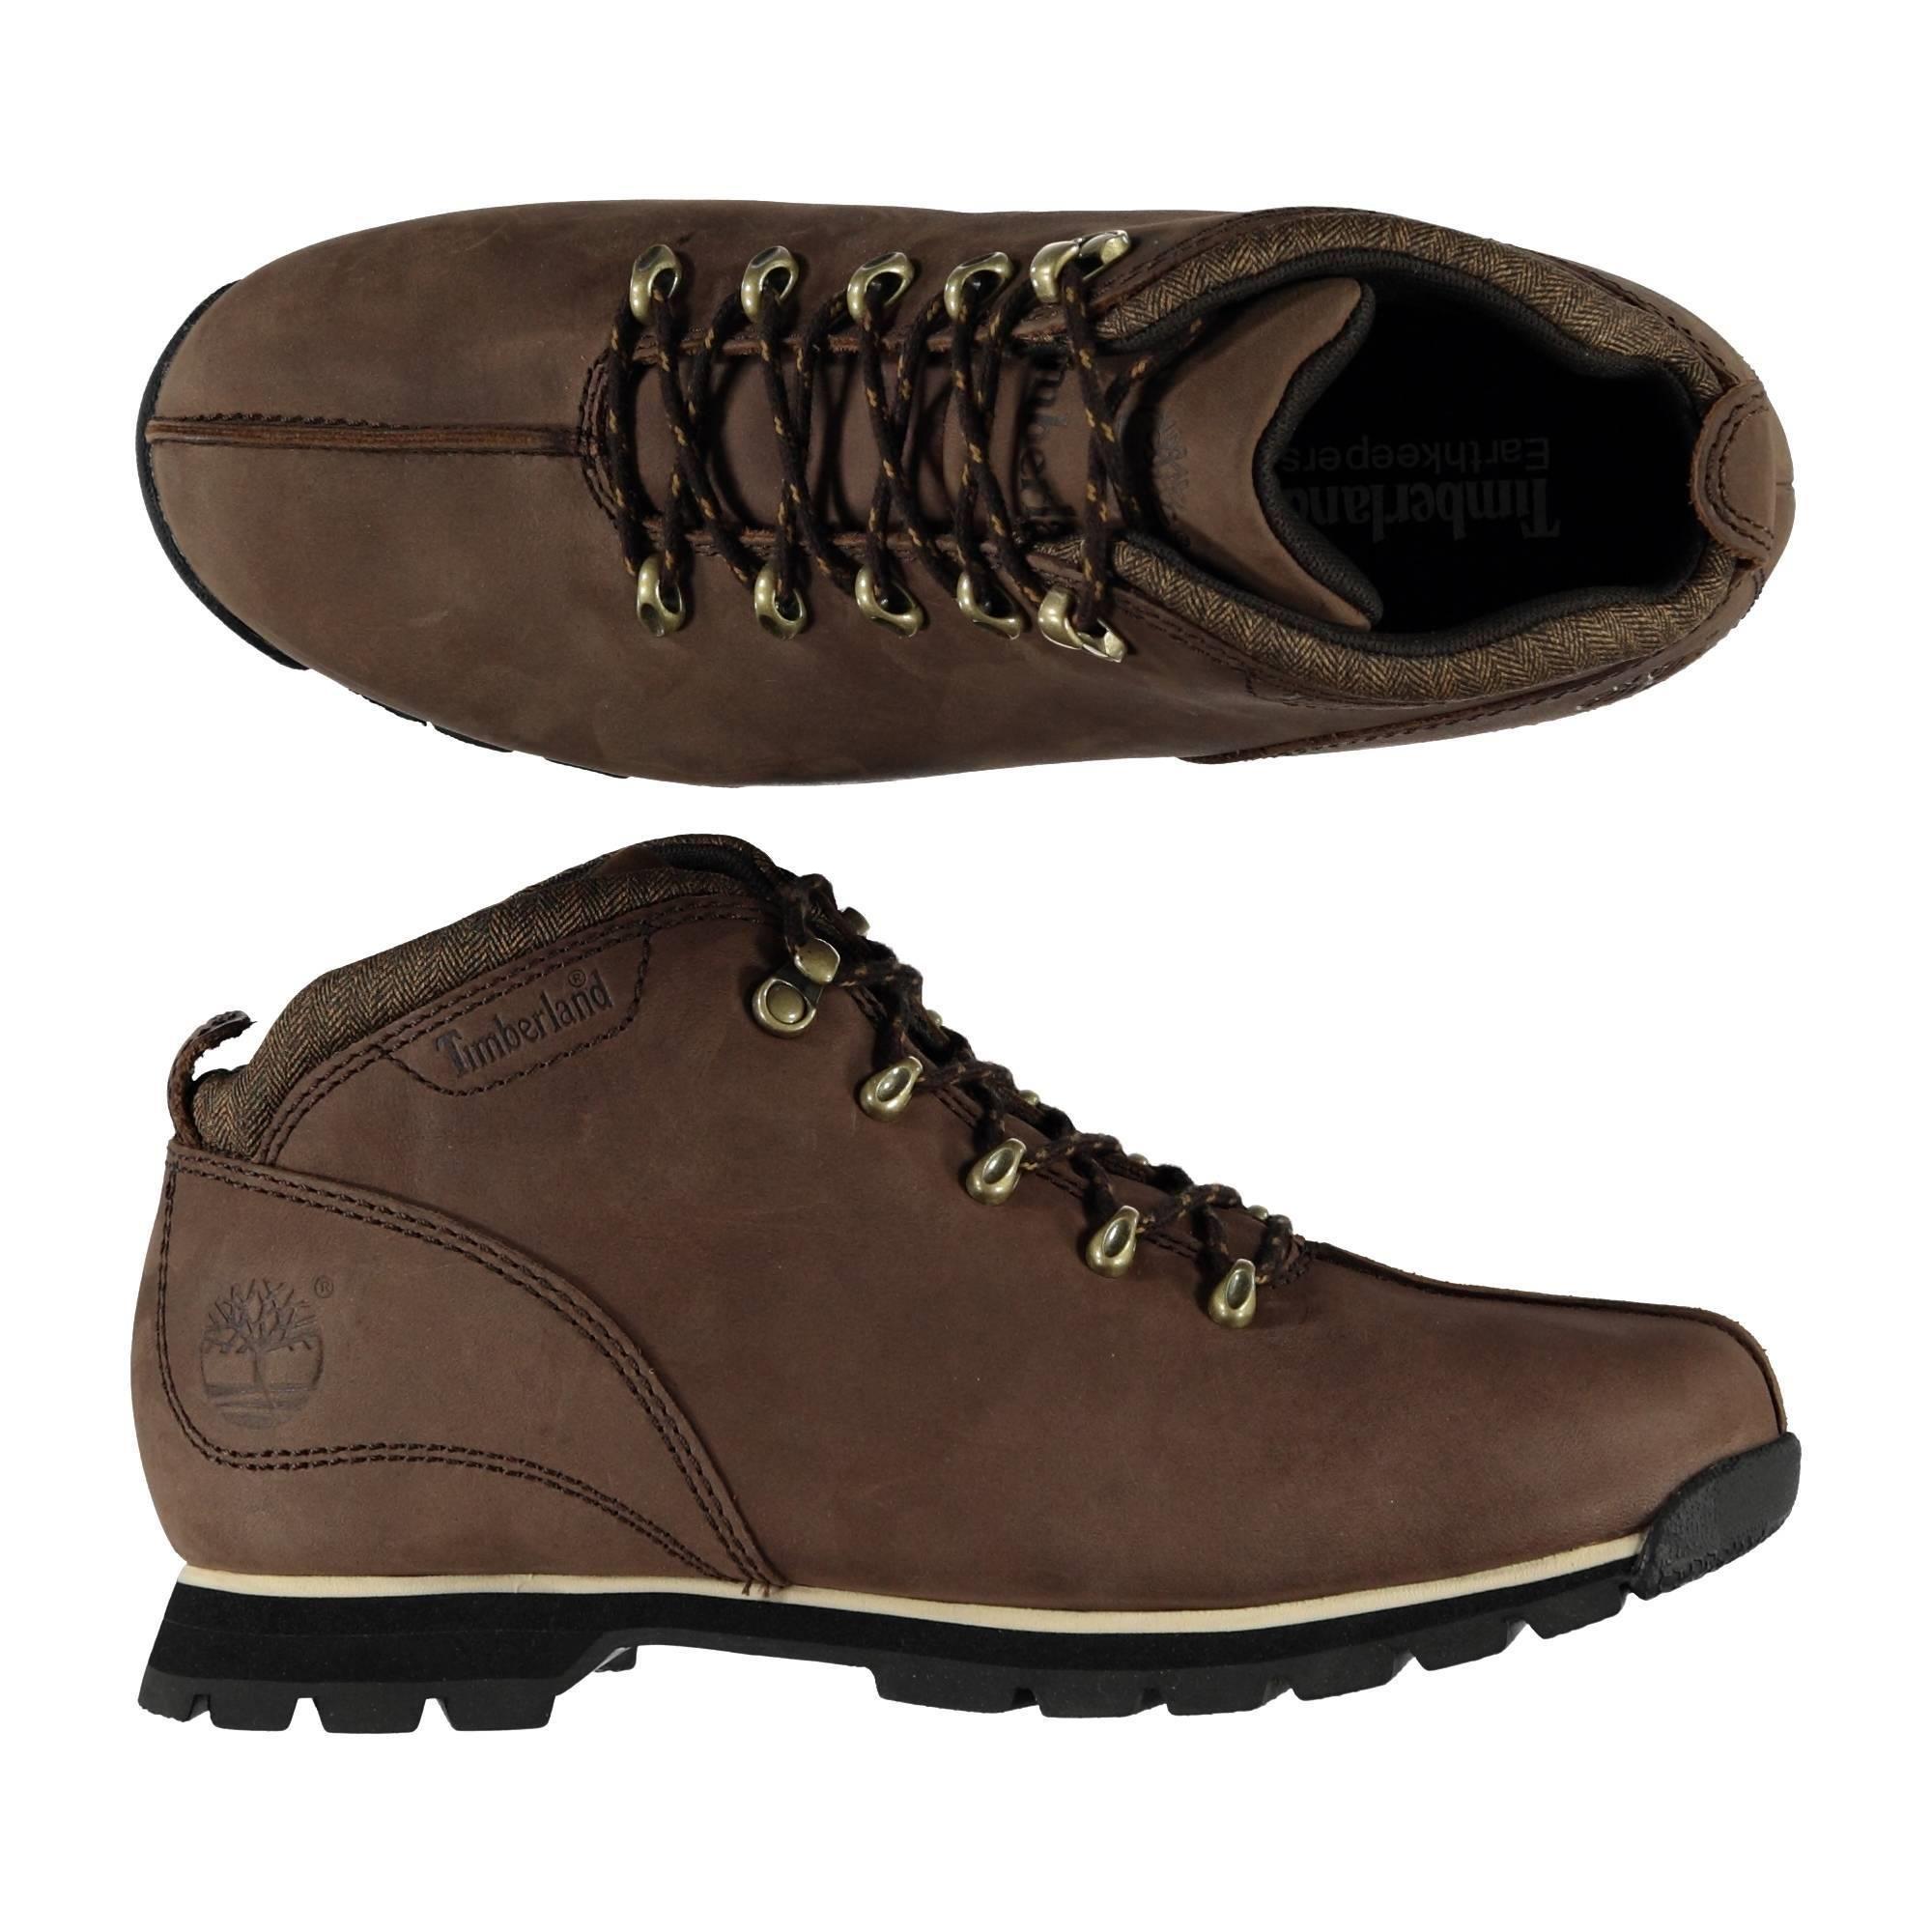 TIMBERLAND EK SPLIT ROCK uomo - e 155,00 scontate del 10% le paghi solo € 140,00! | Nico.it - #nicoit #timberland #boots #timberlandboots #scarponcini #man #winter #fashion #ootd #bestoftheday